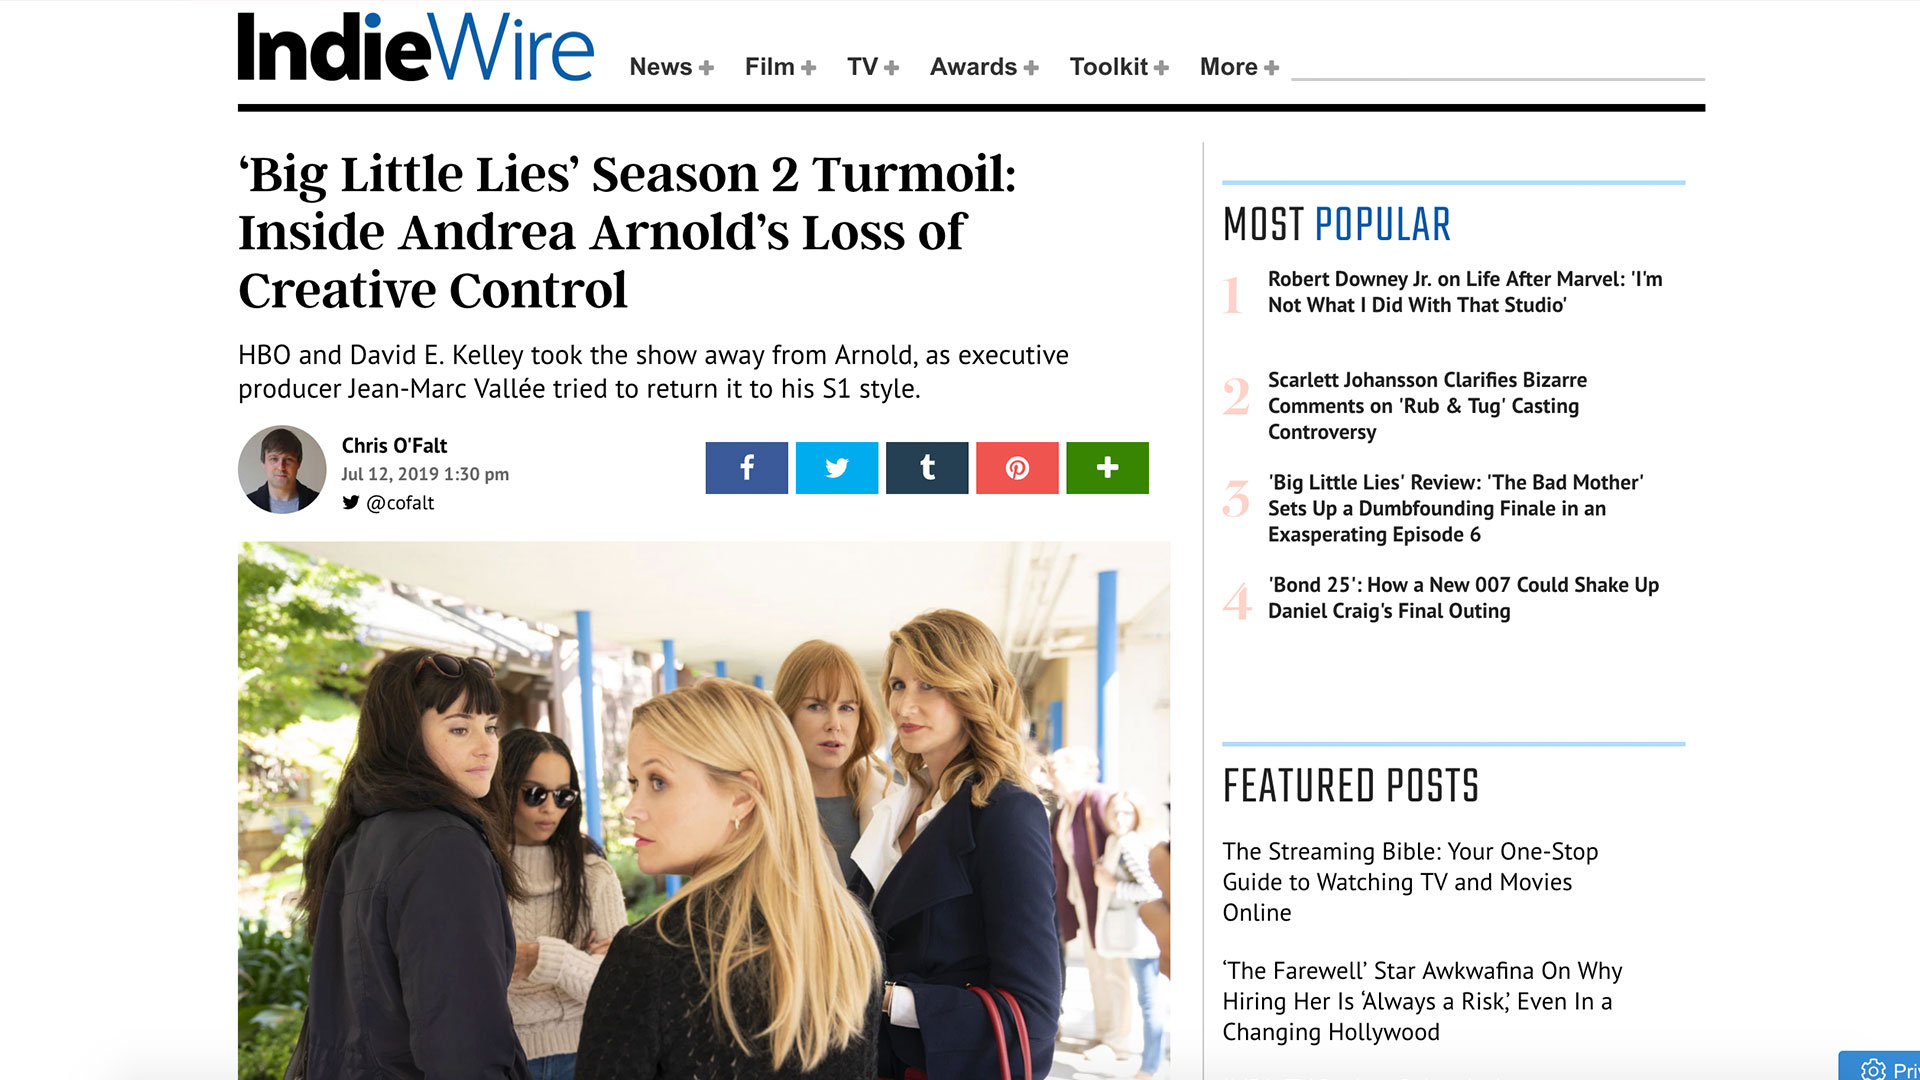 Fairness Rocks News 'Big Little Lies' Season 2 Turmoil: Inside Andrea Arnold's Loss of Creative Control